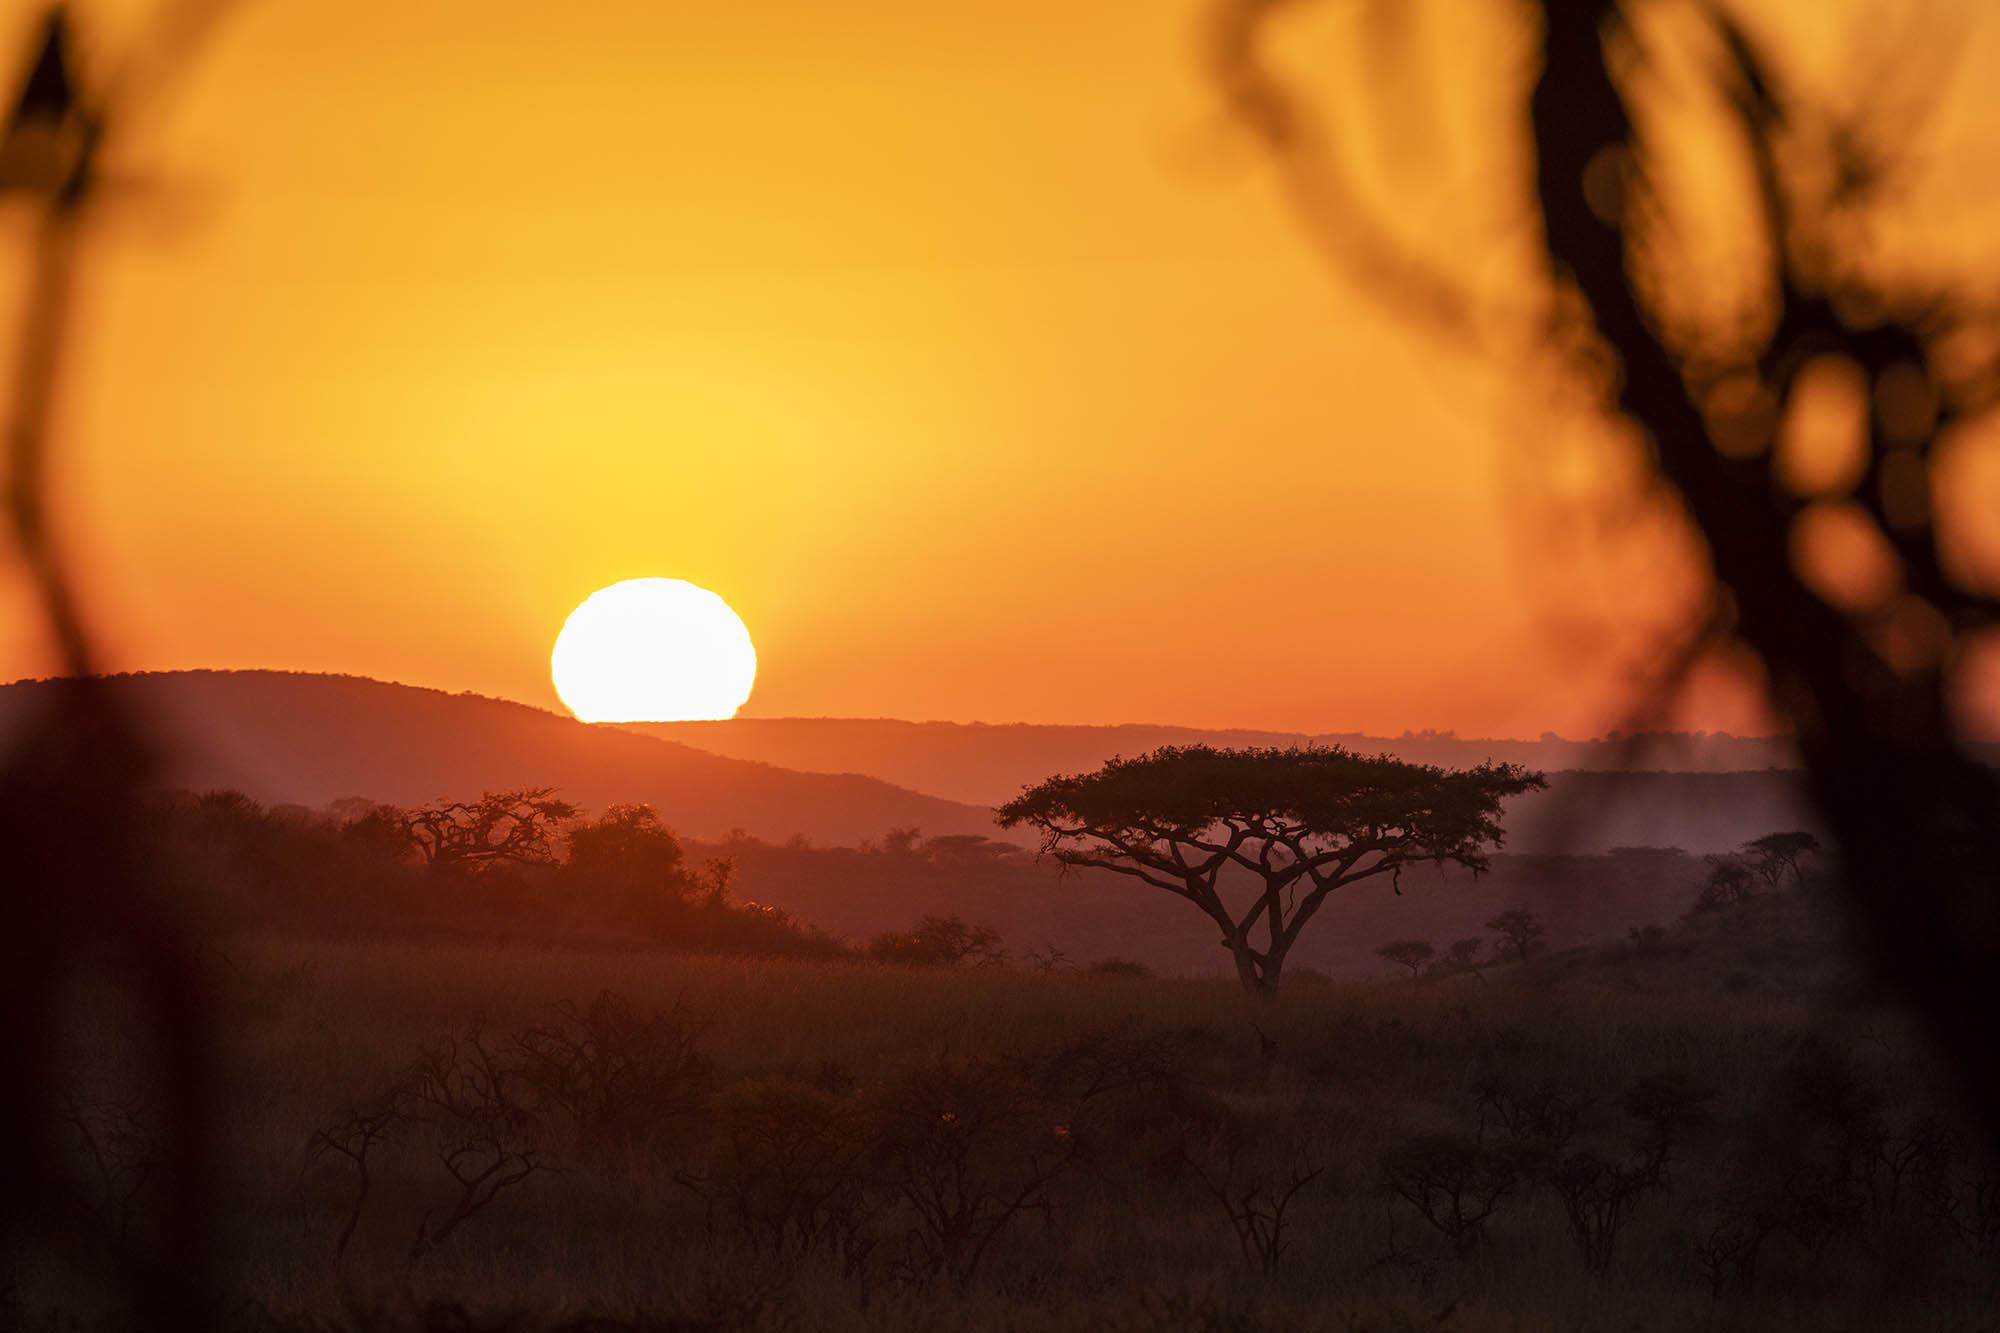 Ndaka safari lodge - Nambiti big 5 private game reserve